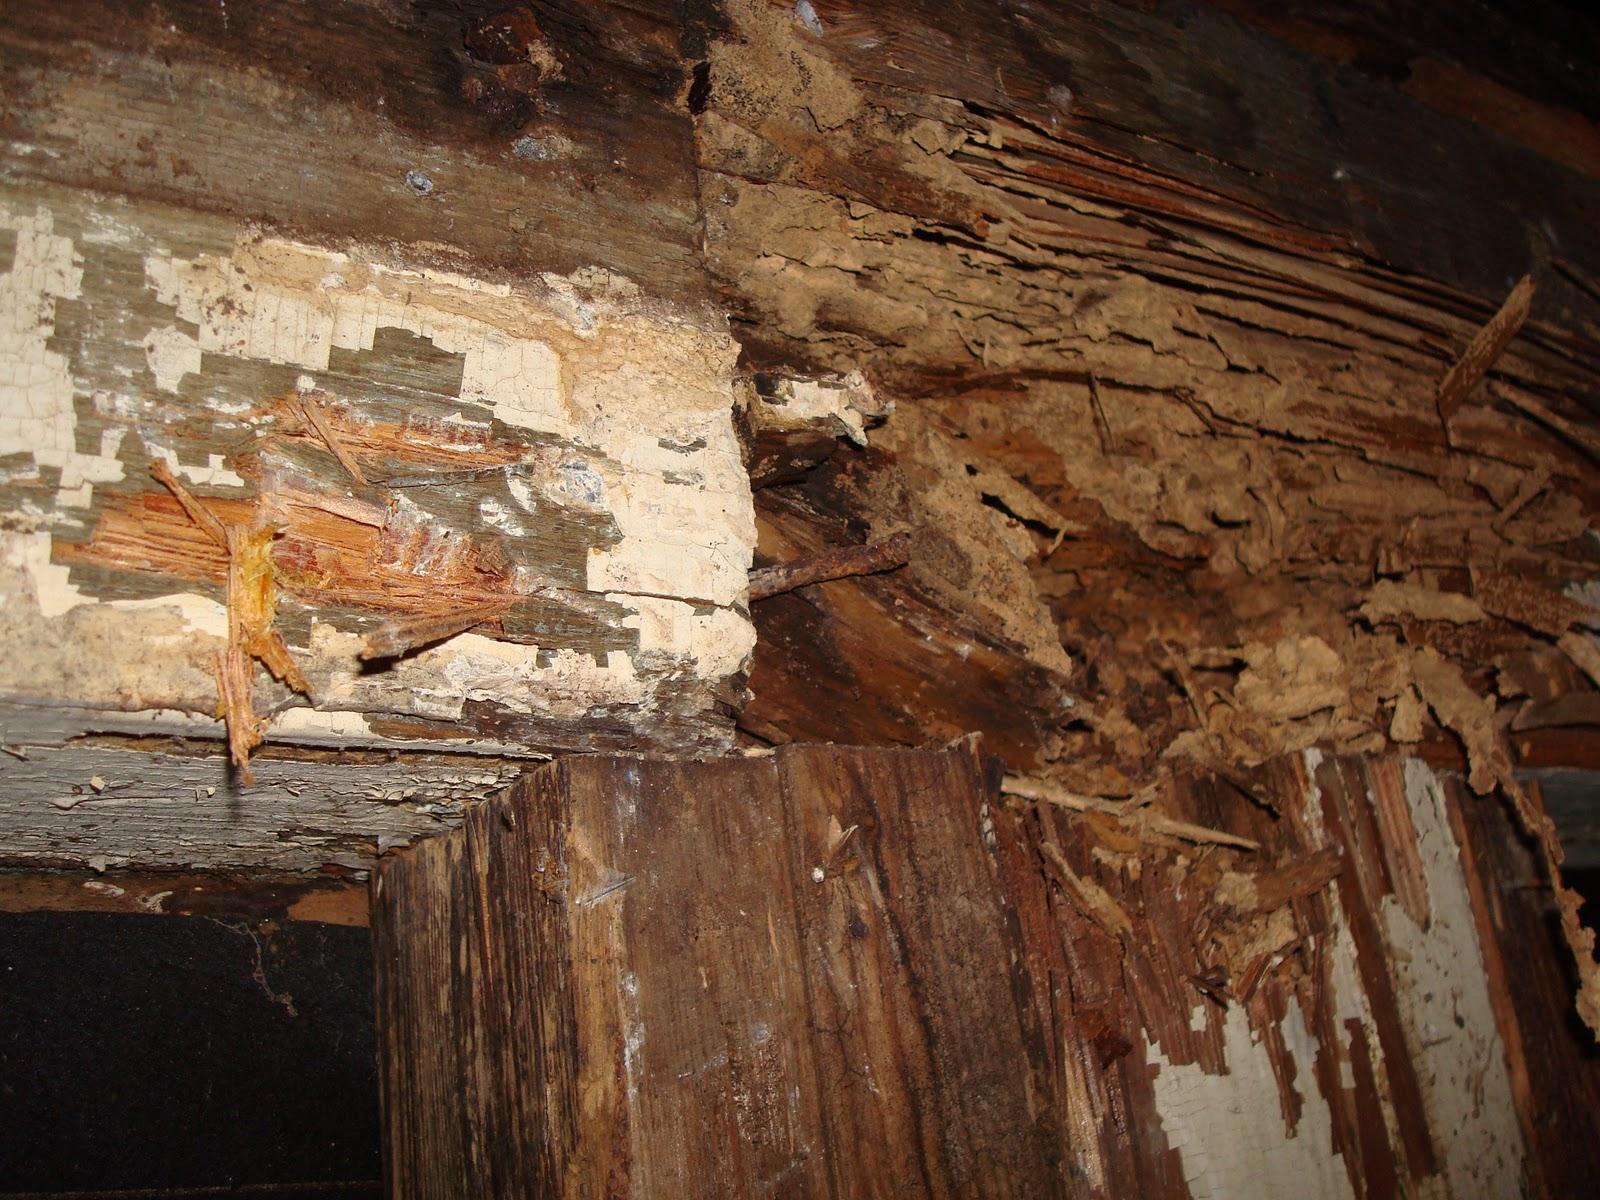 termite-damage-in-walls.jpg